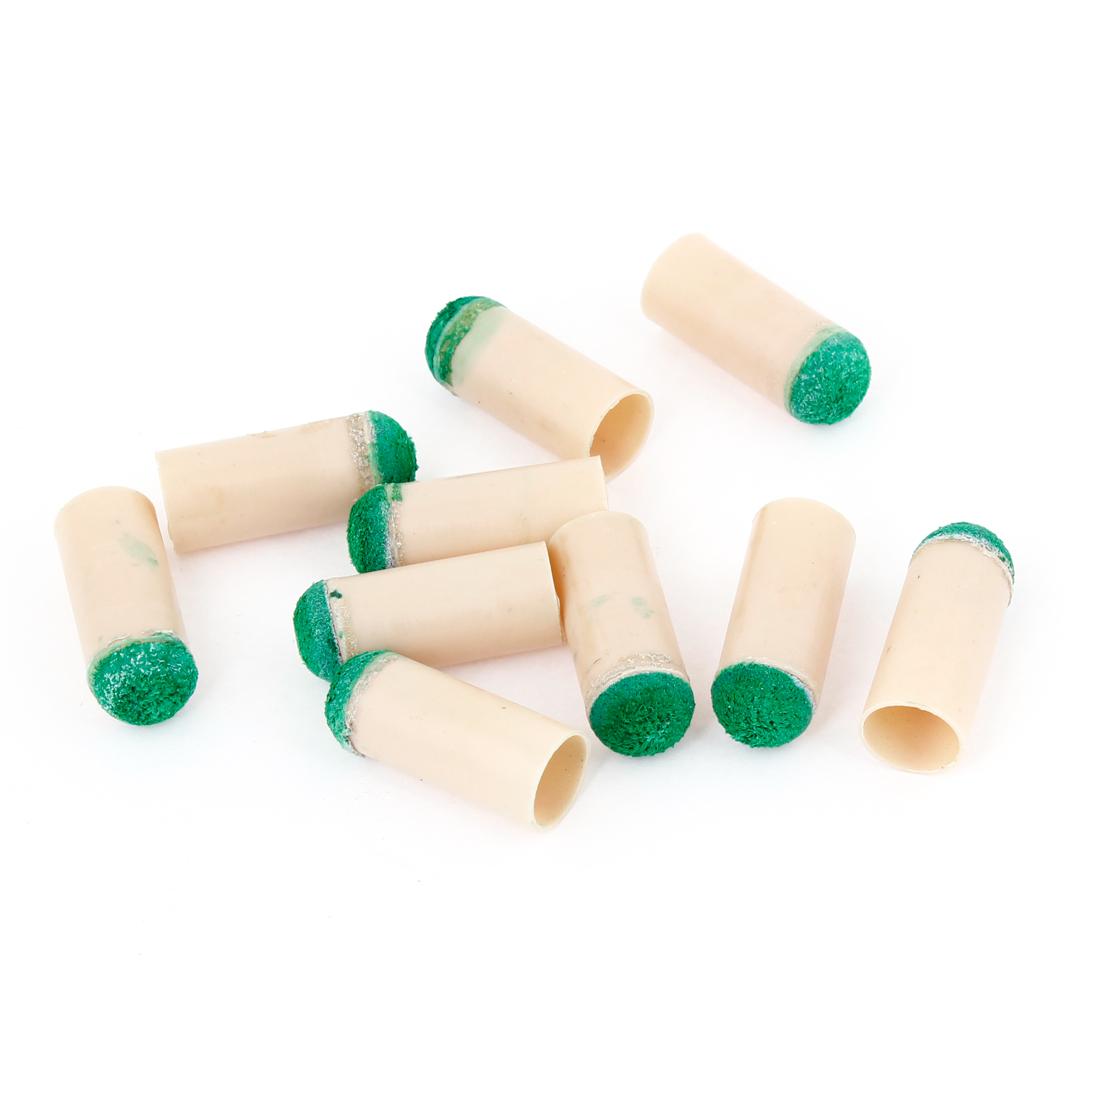 Green Beige Plastic 10mm Dia Cylindrical Billiards Stick Pole Tips 10Pcs